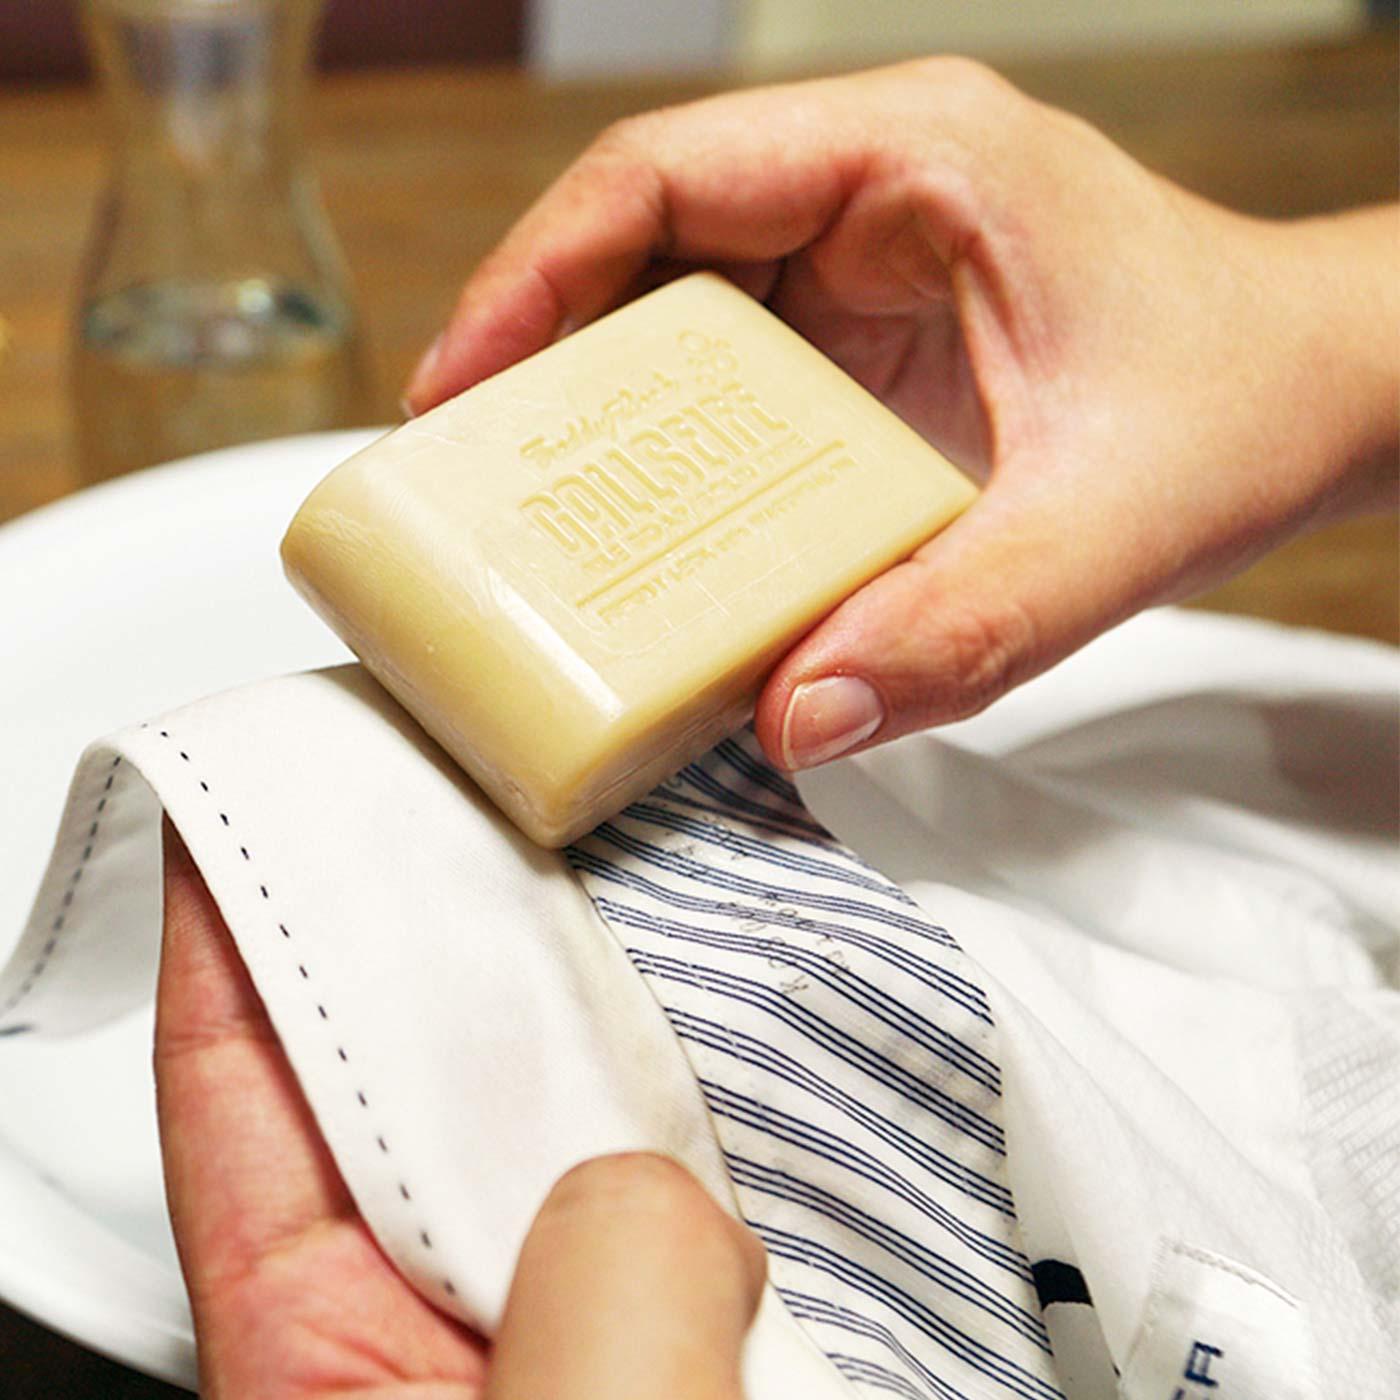 HOW TO USE(3)胆汁せっけんを塗り込みます。